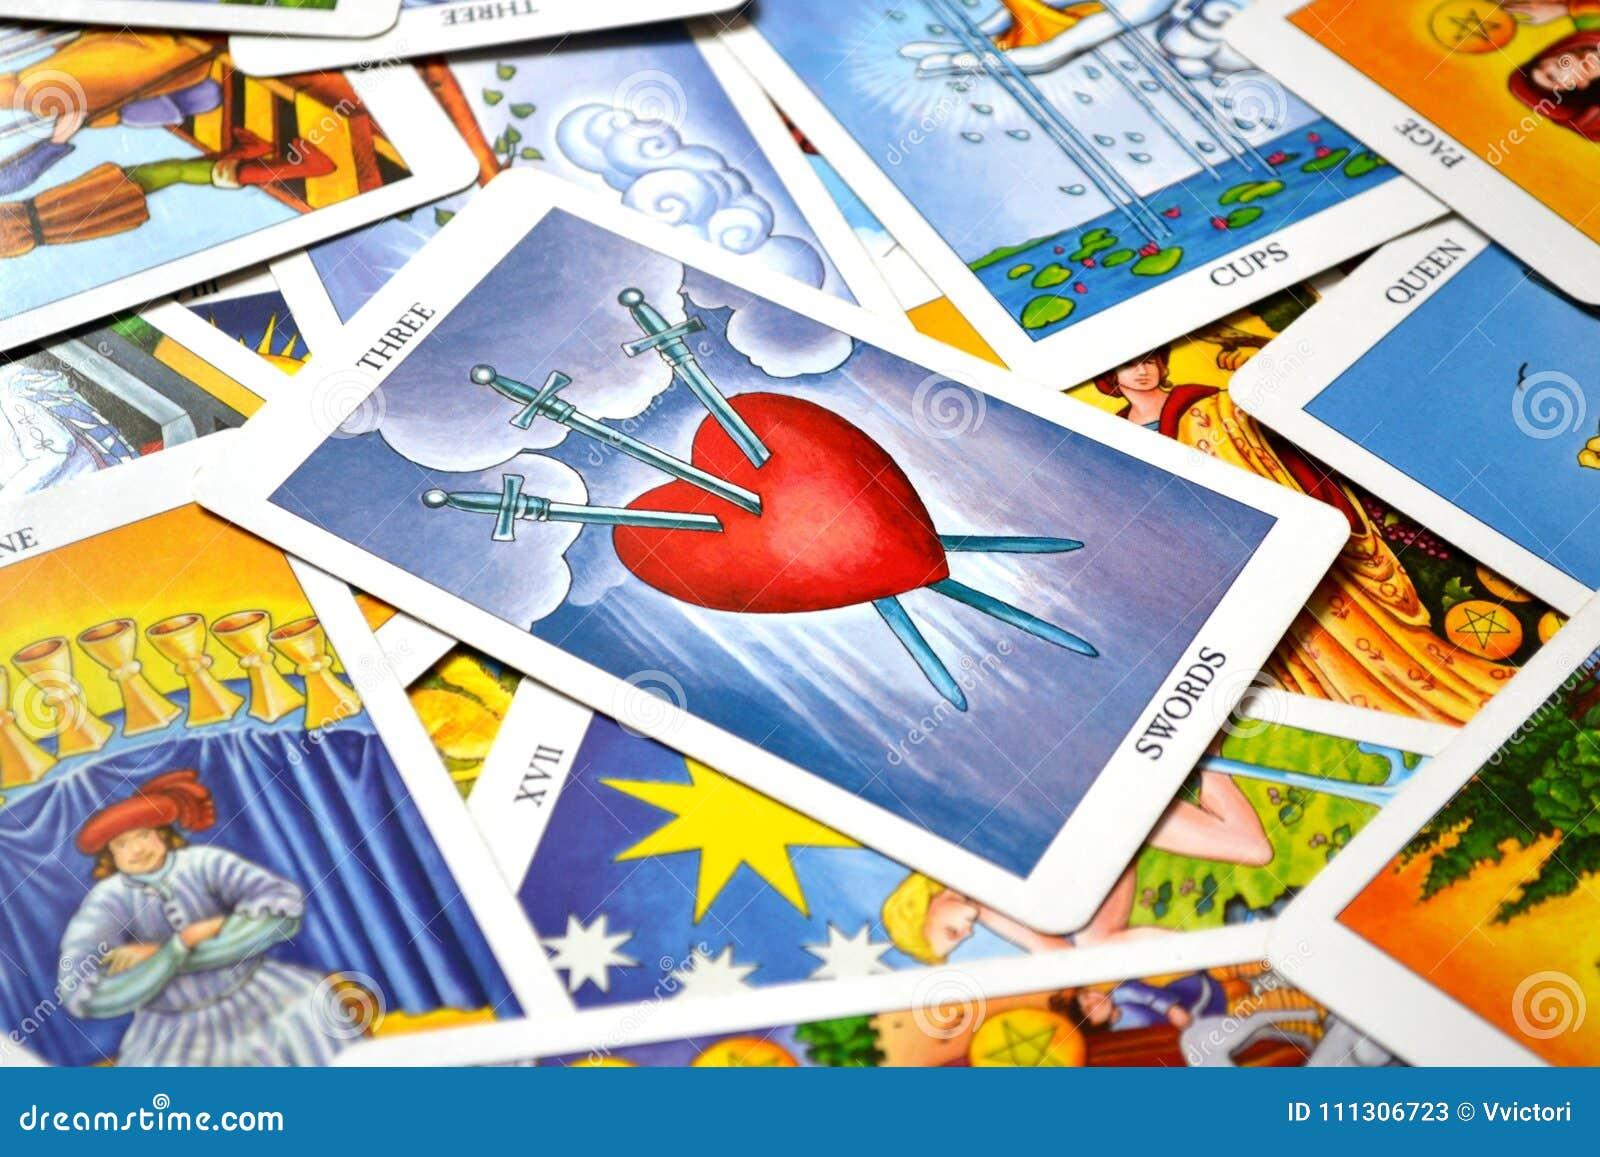 3 of Swords Tarot Card Heartbreak Tears Pain Deep Sadness